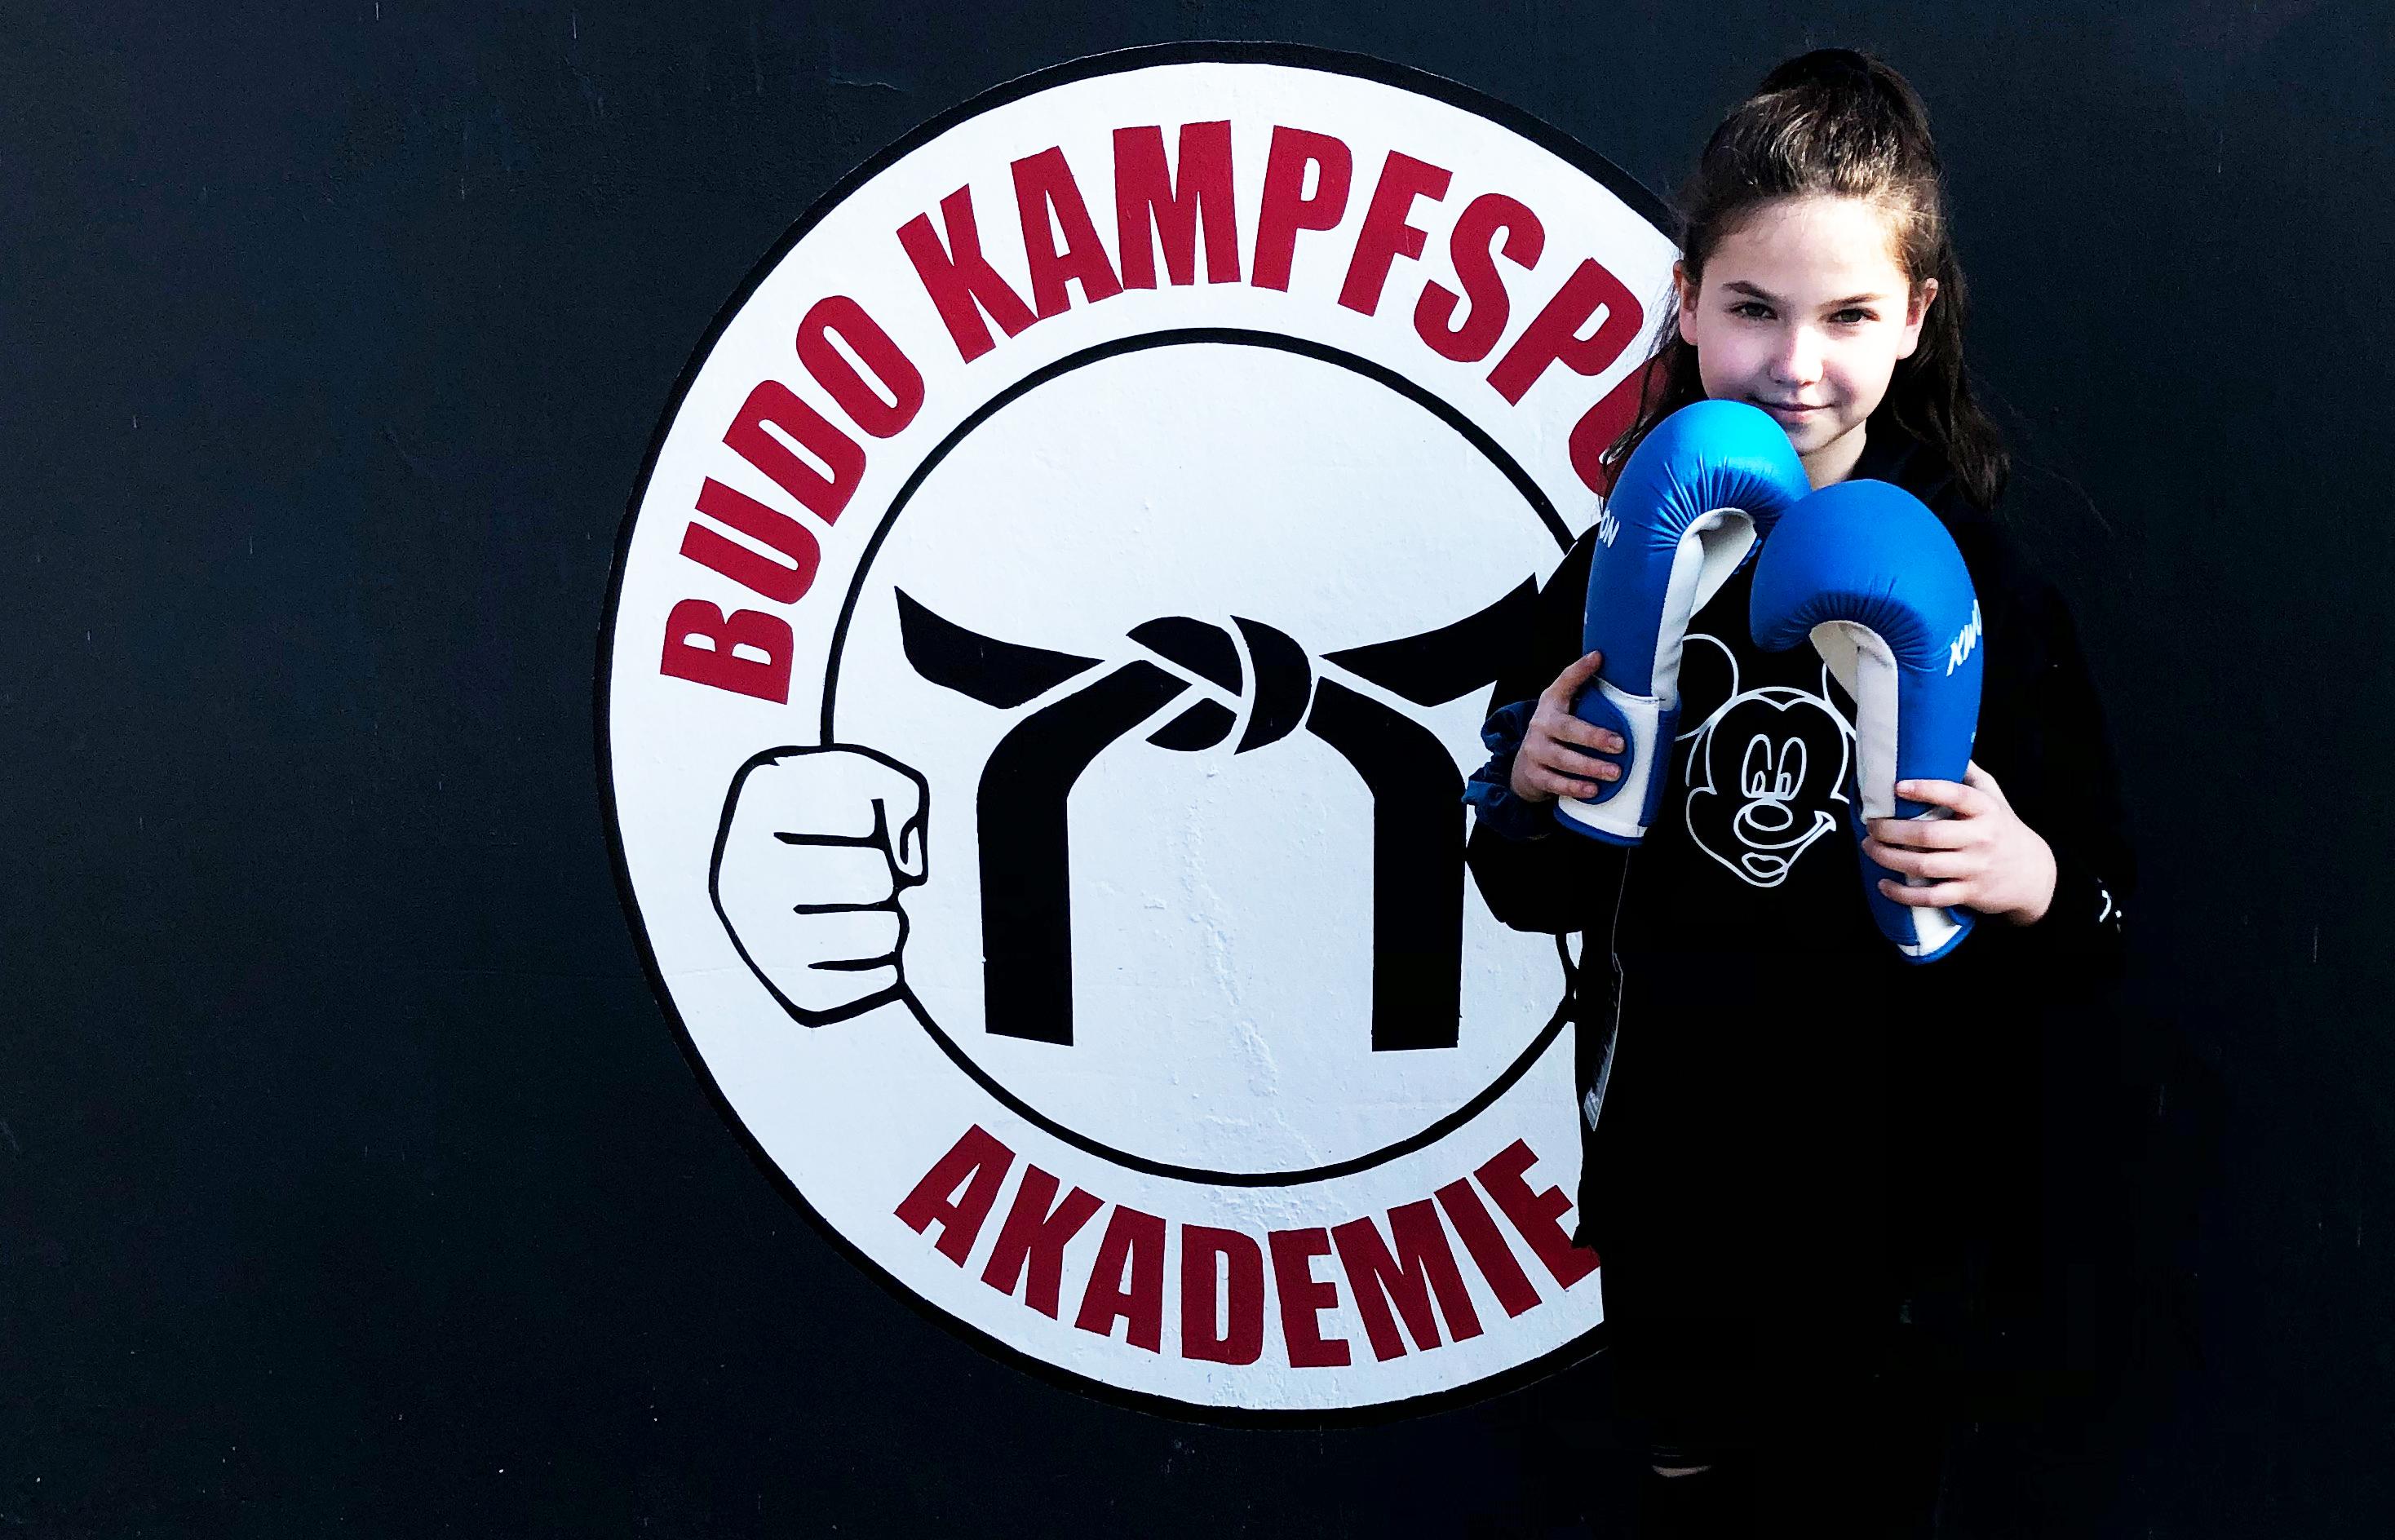 Kampfsport Bergedorf